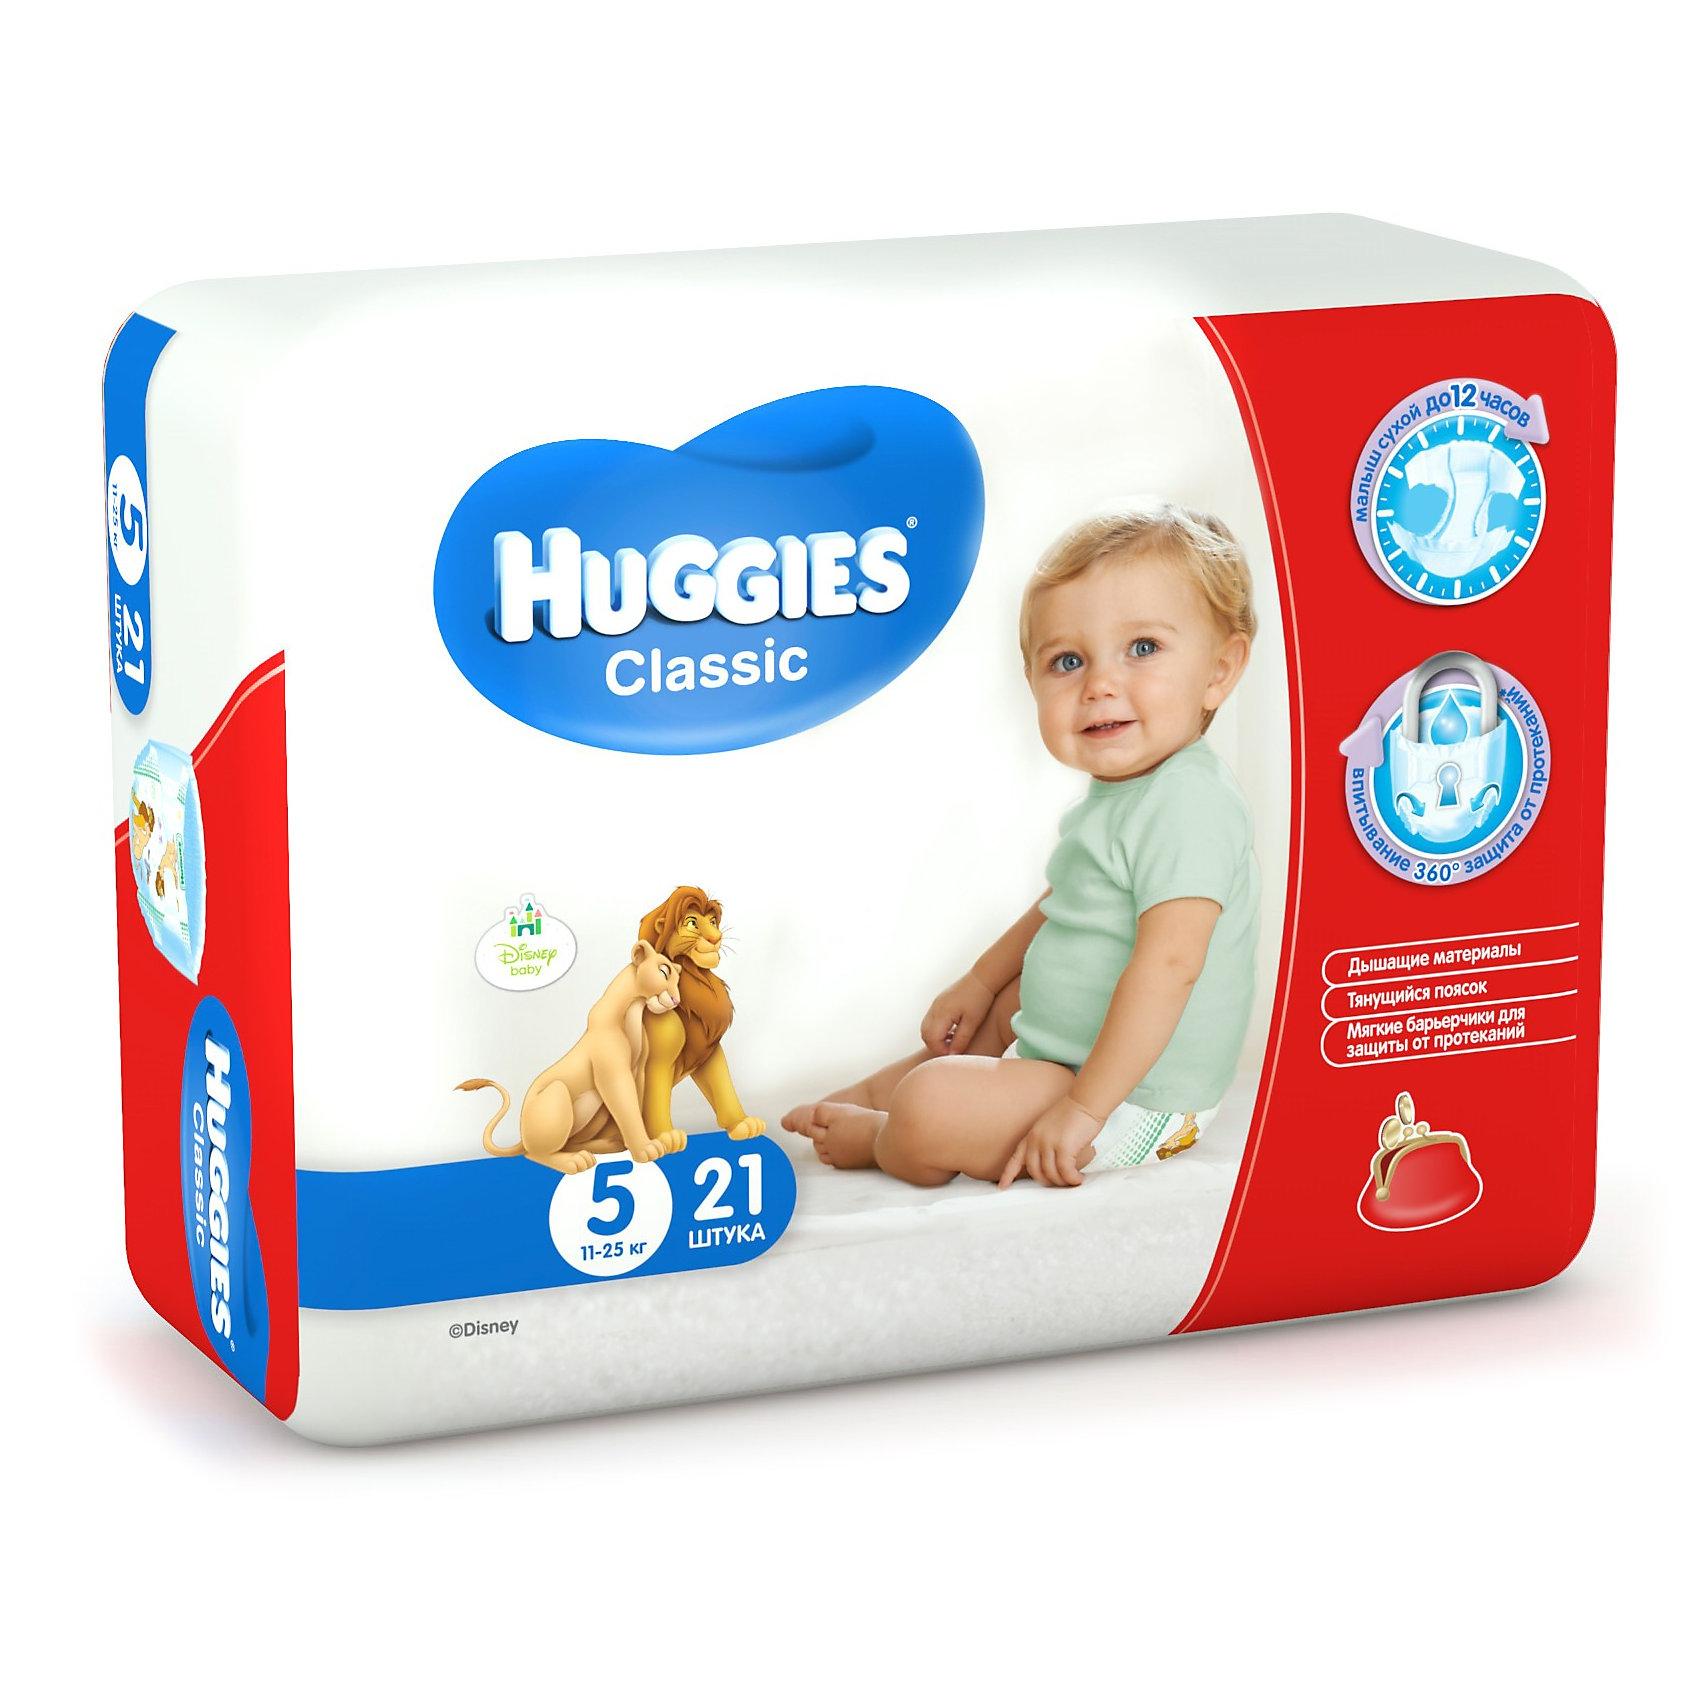 HUGGIES Подгузники Huggies Classic (5) Econom Pack 11-25 кг, 21 шт.